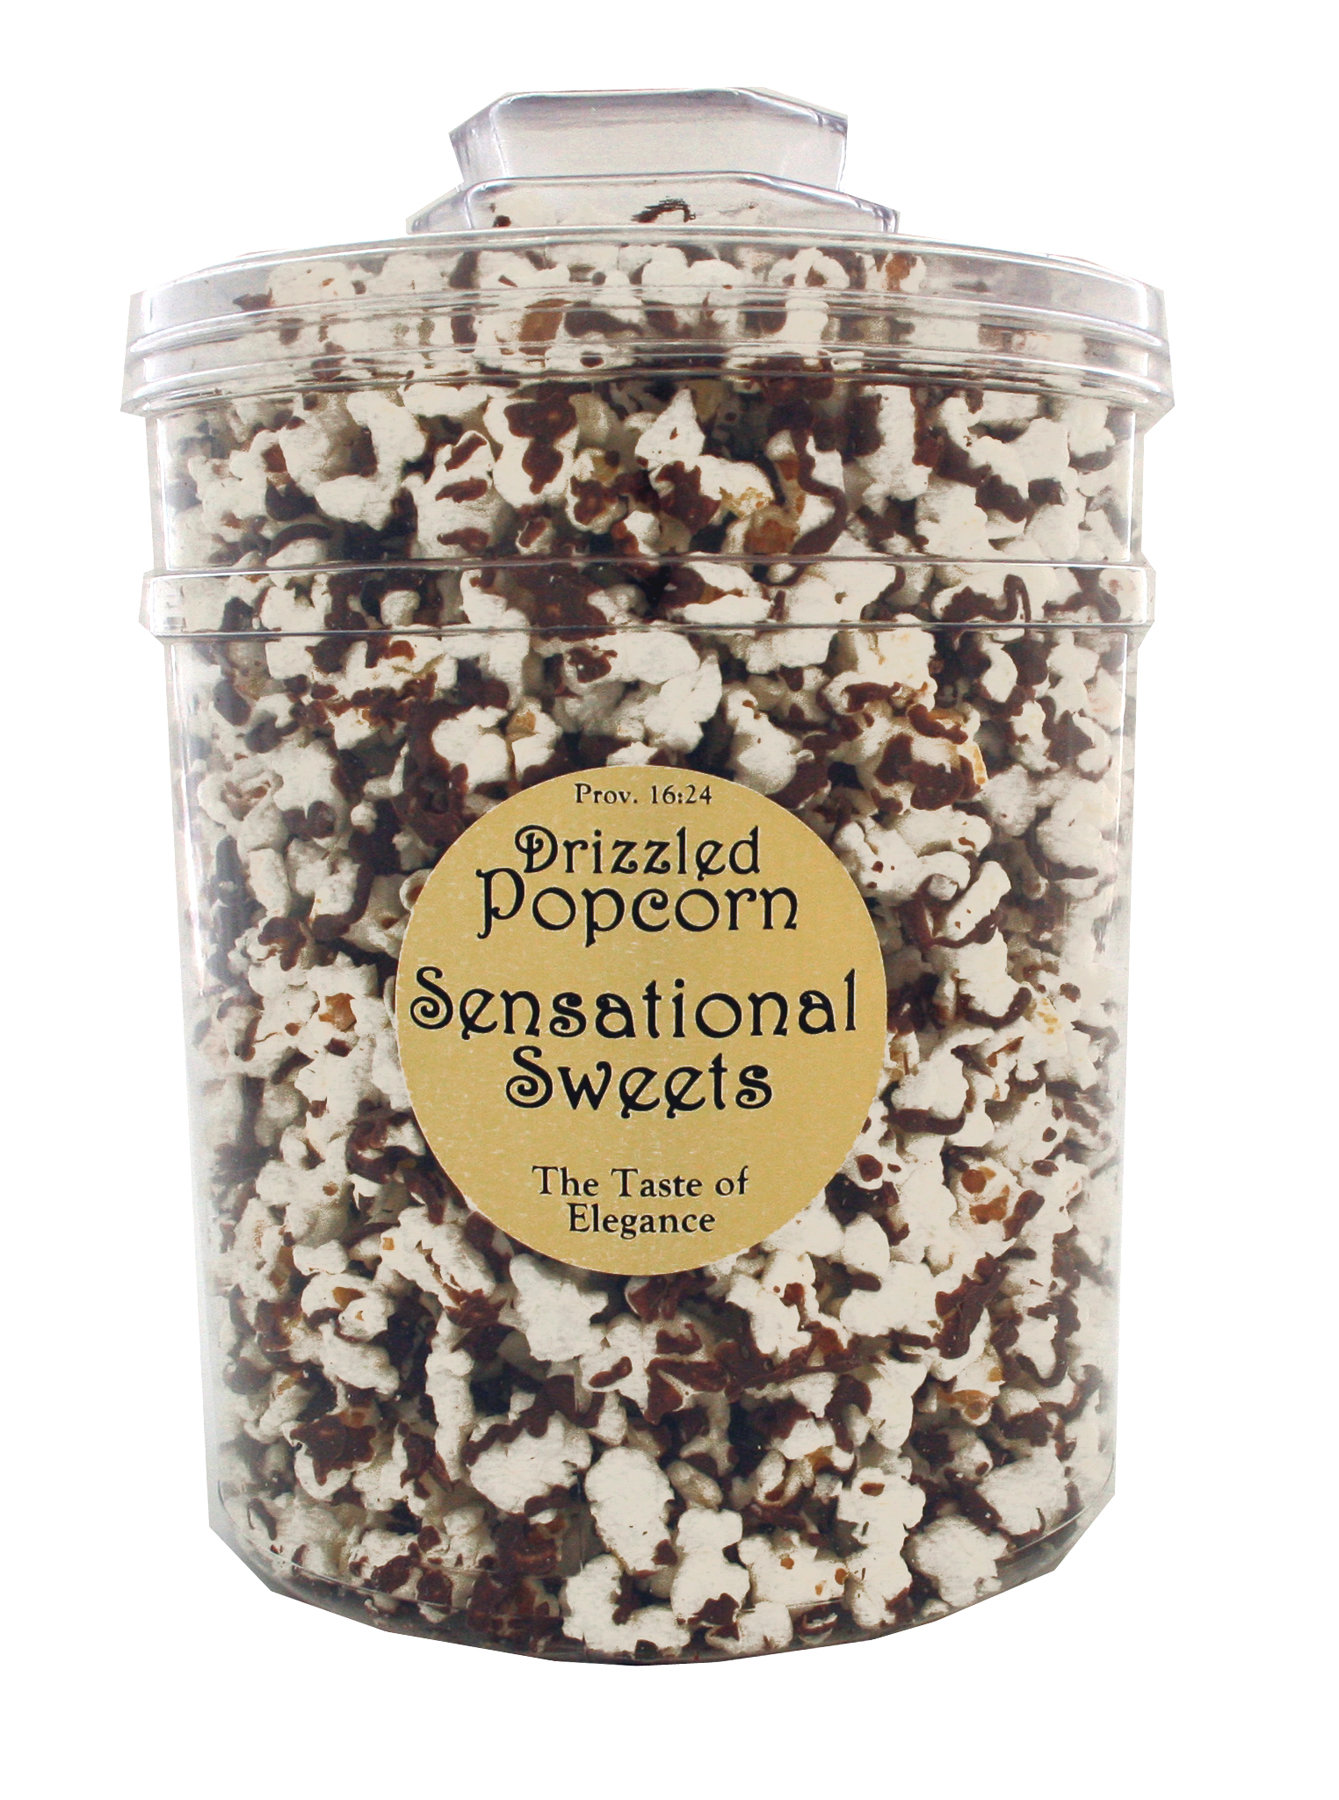 Gourmet Chocolate Drizzled Popcorn - 1 lb. Knob Tub - Wholesale W-PC107